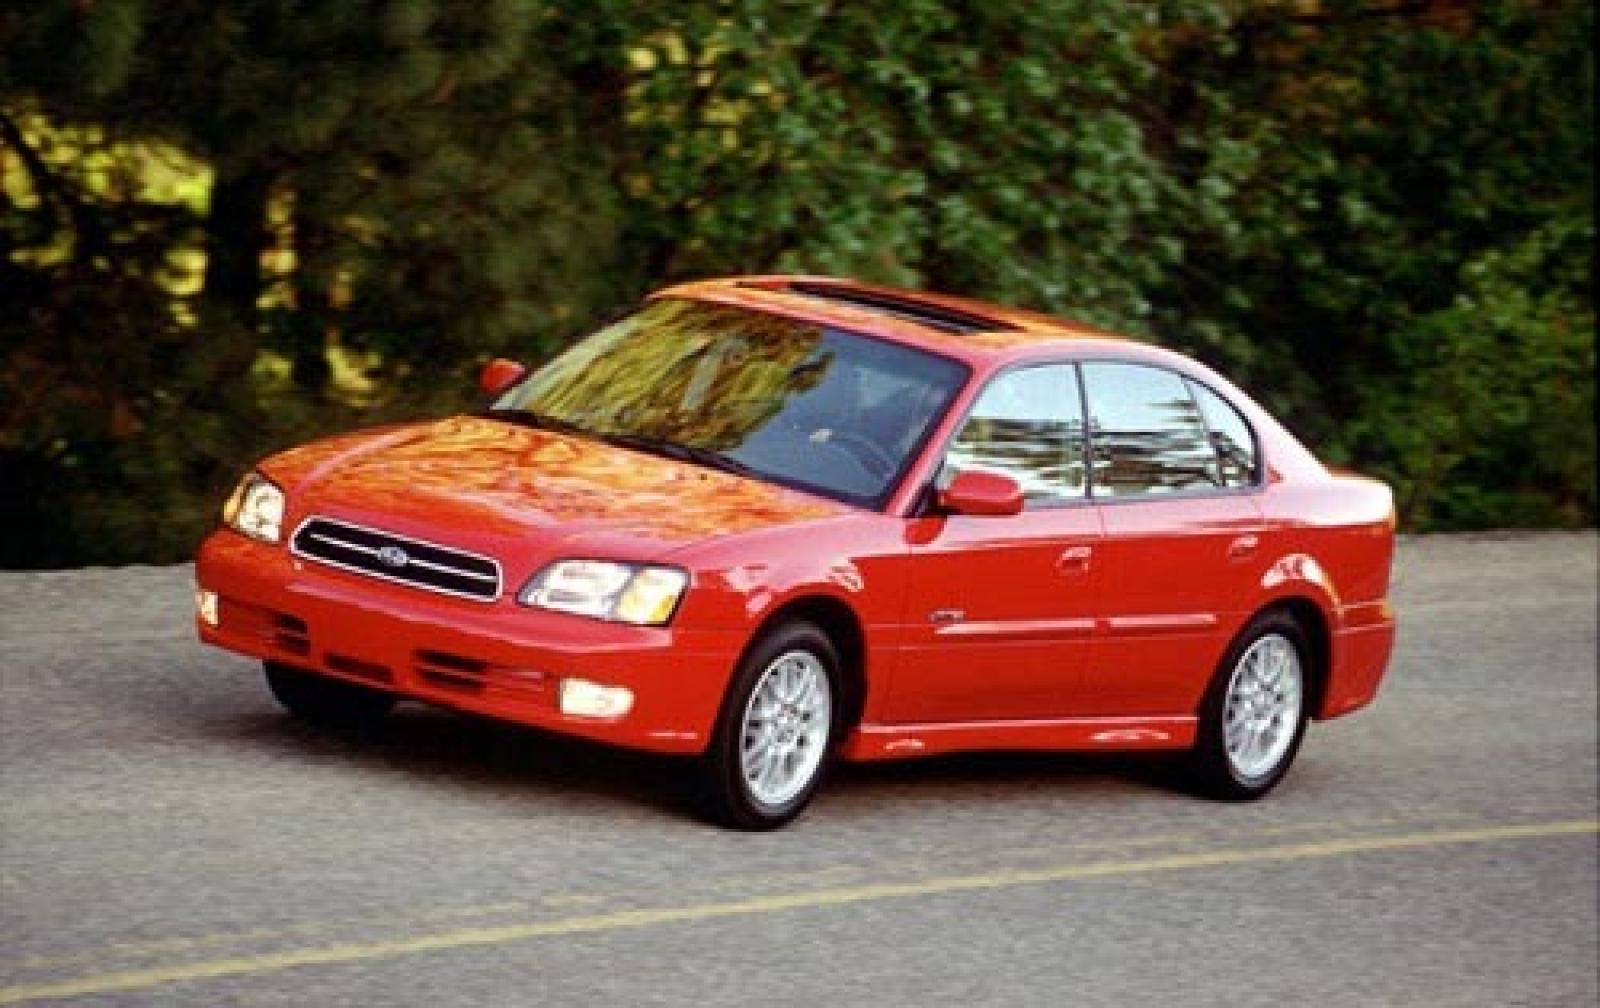 800 1024 1280 1600 origin 2001 Subaru Legacy ...